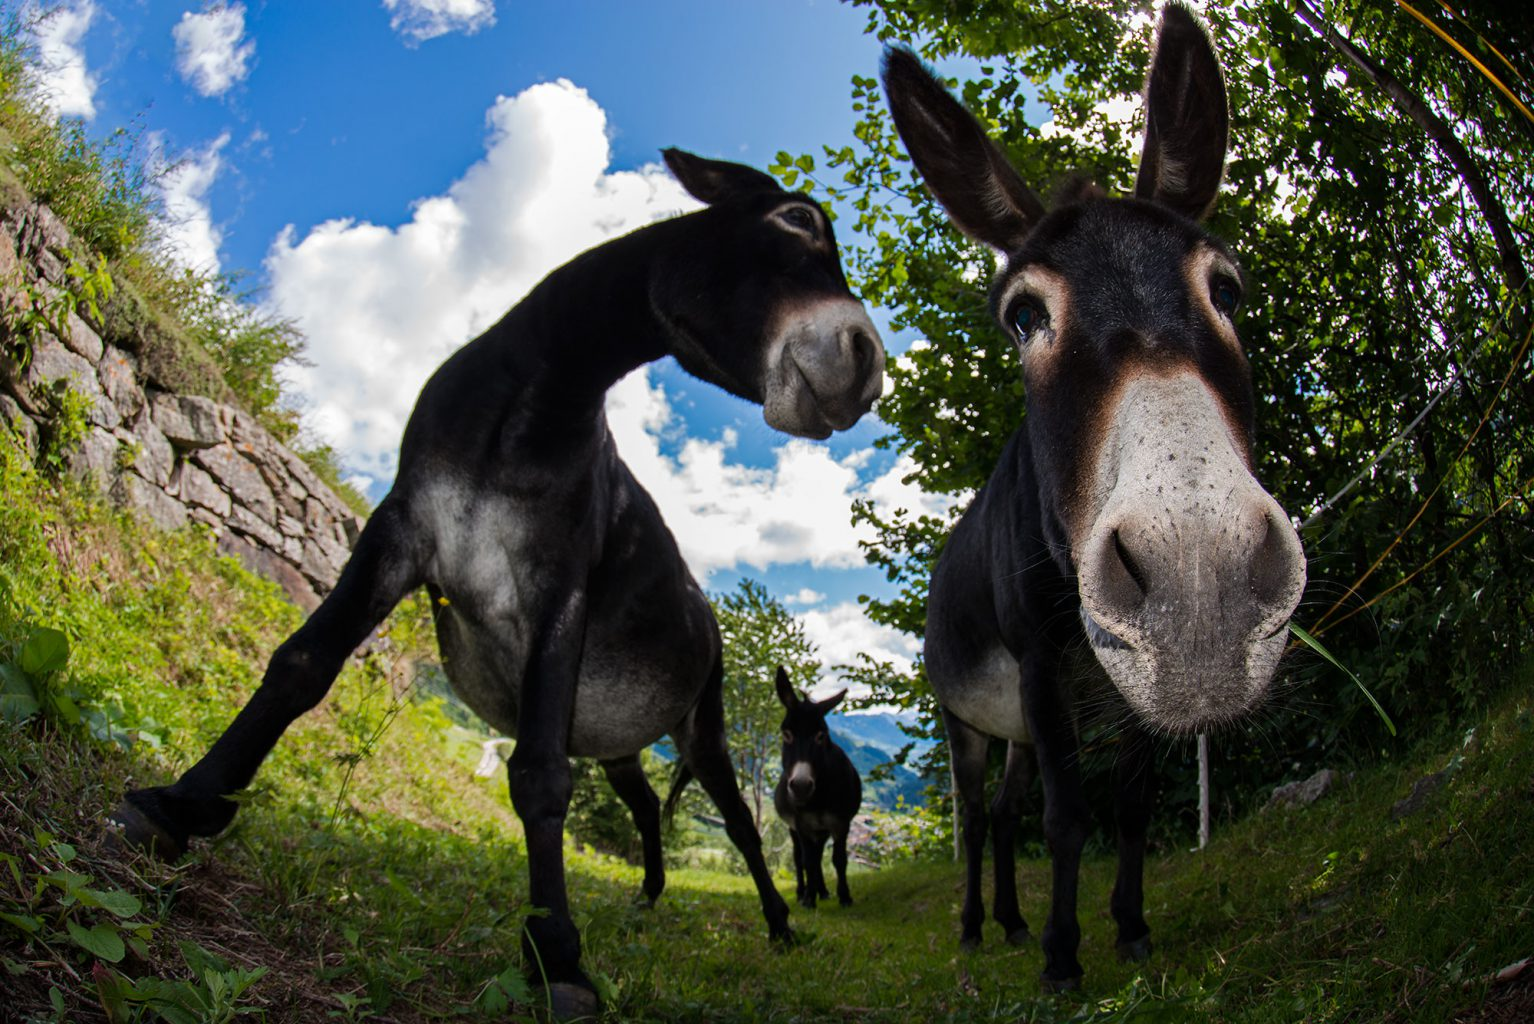 Donkeys, Airolo, Ticino - Switzerland